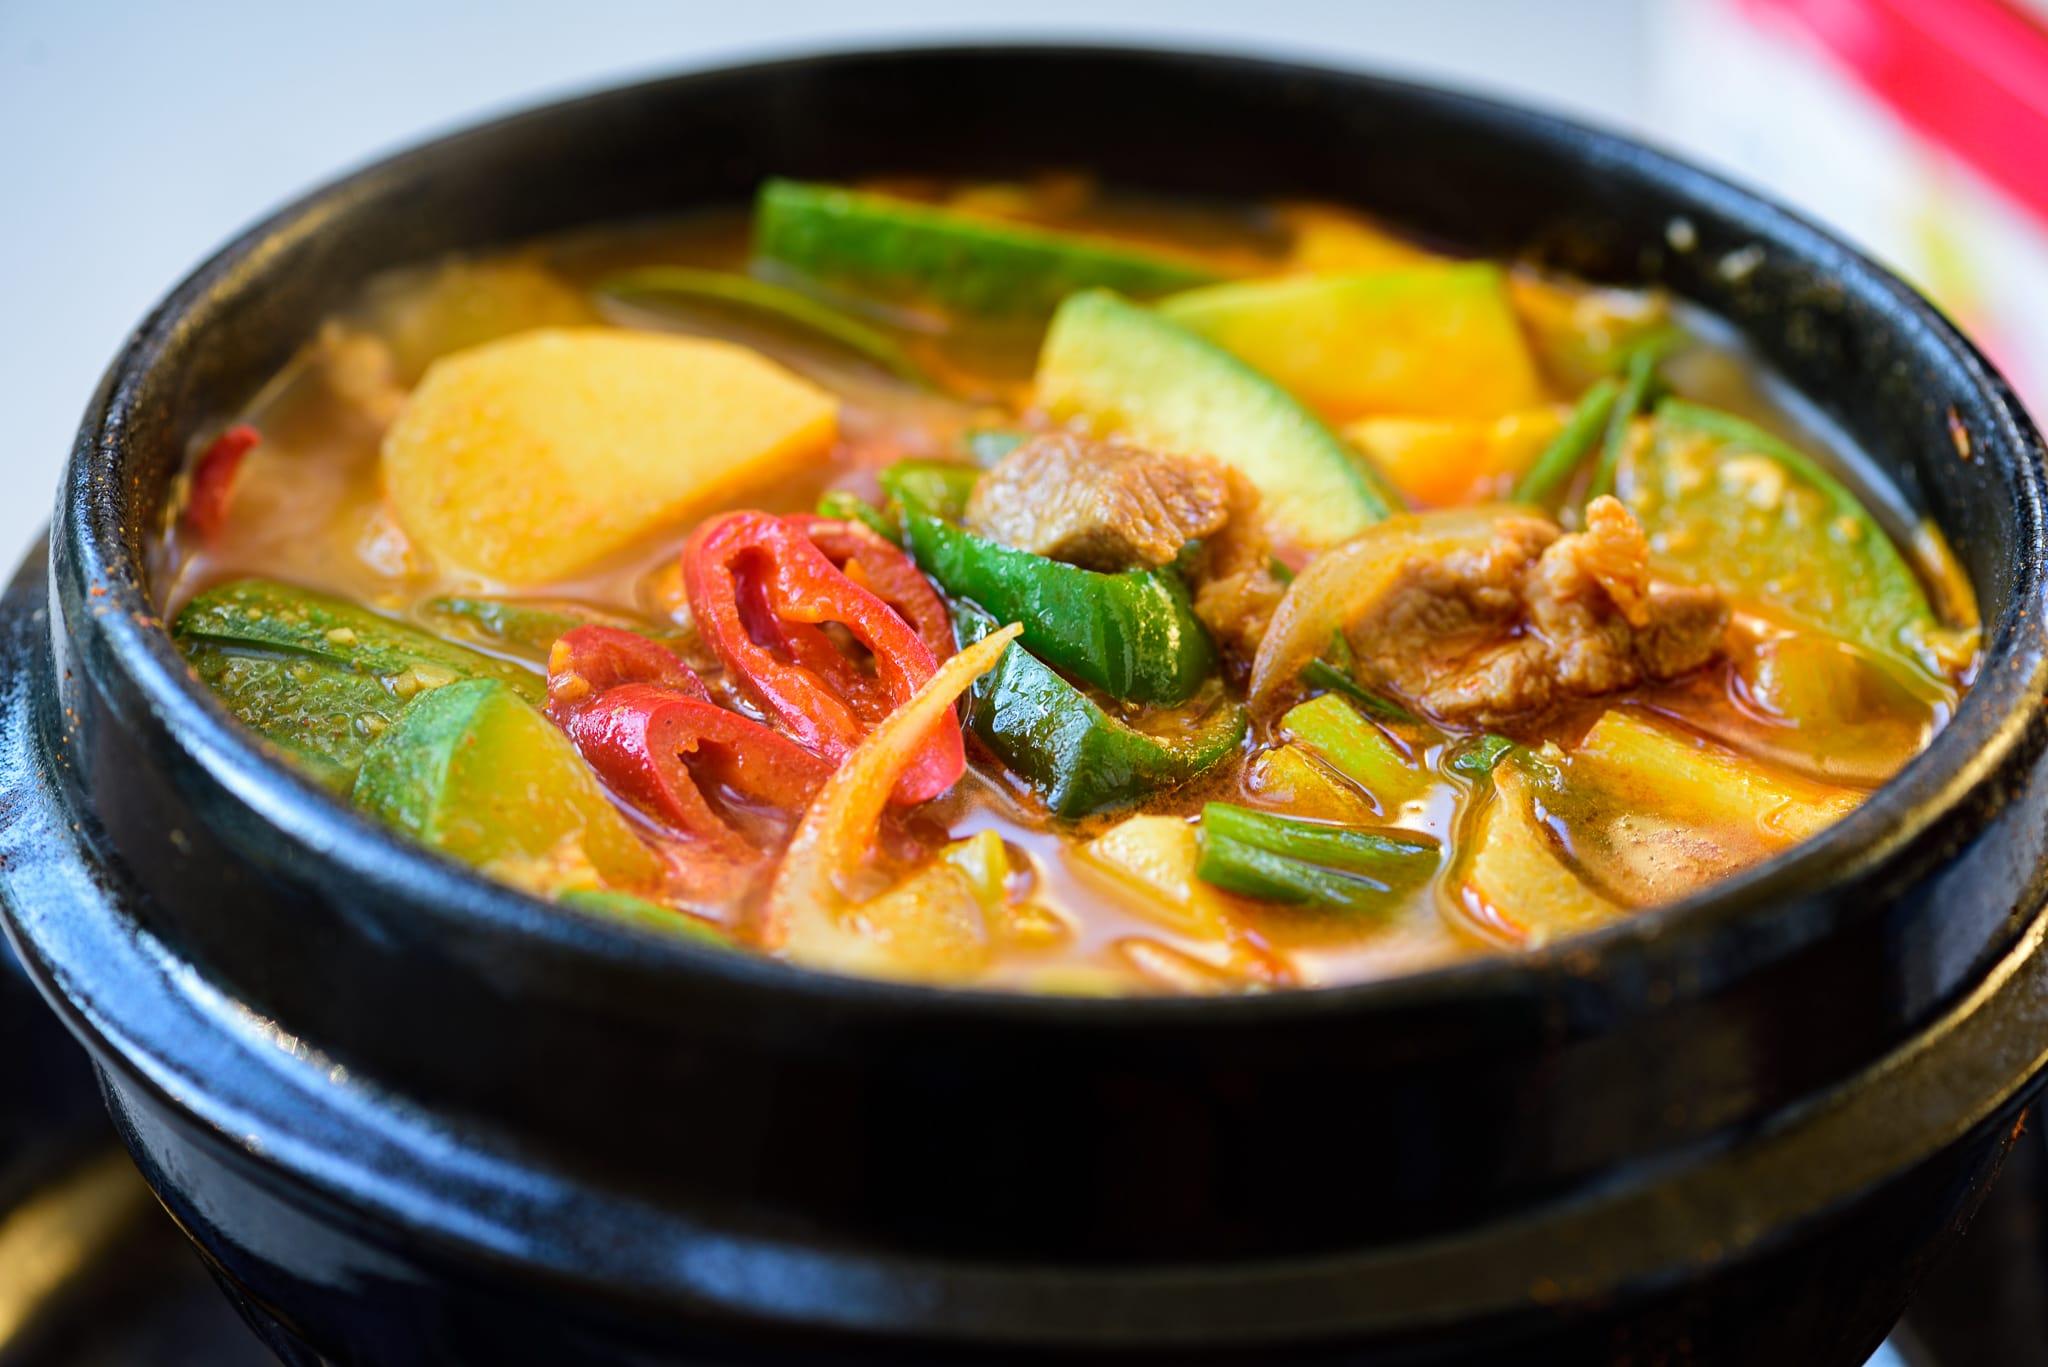 DSC2531 - Gochujang Jjigae (Gochujang Stew with Zucchini)